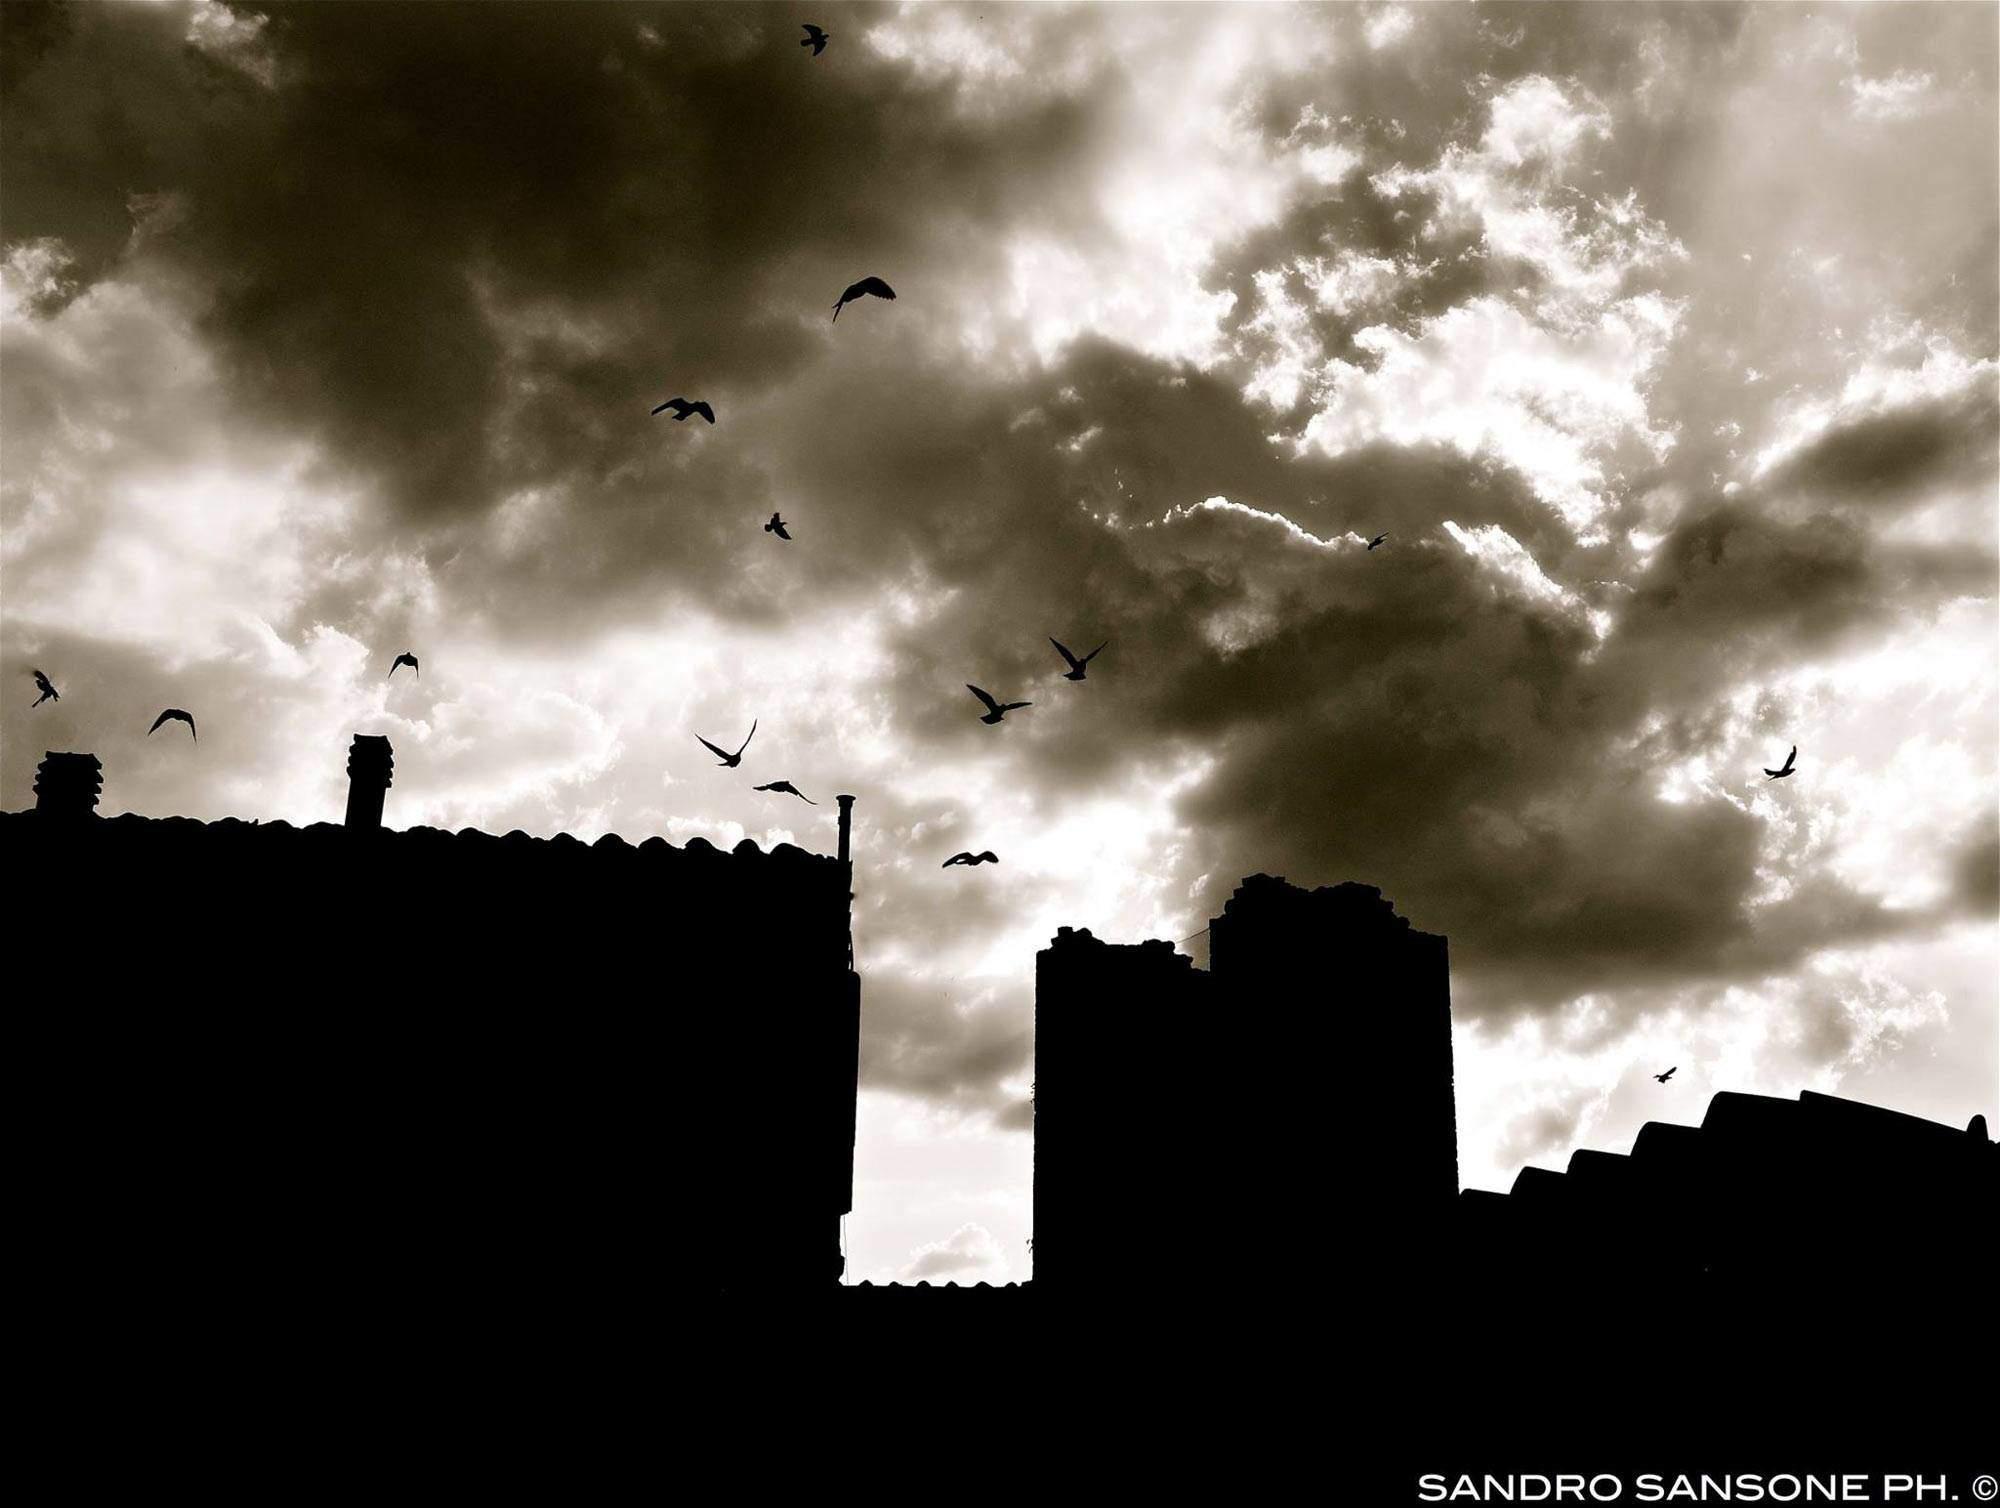 Sandro-Sansone_002